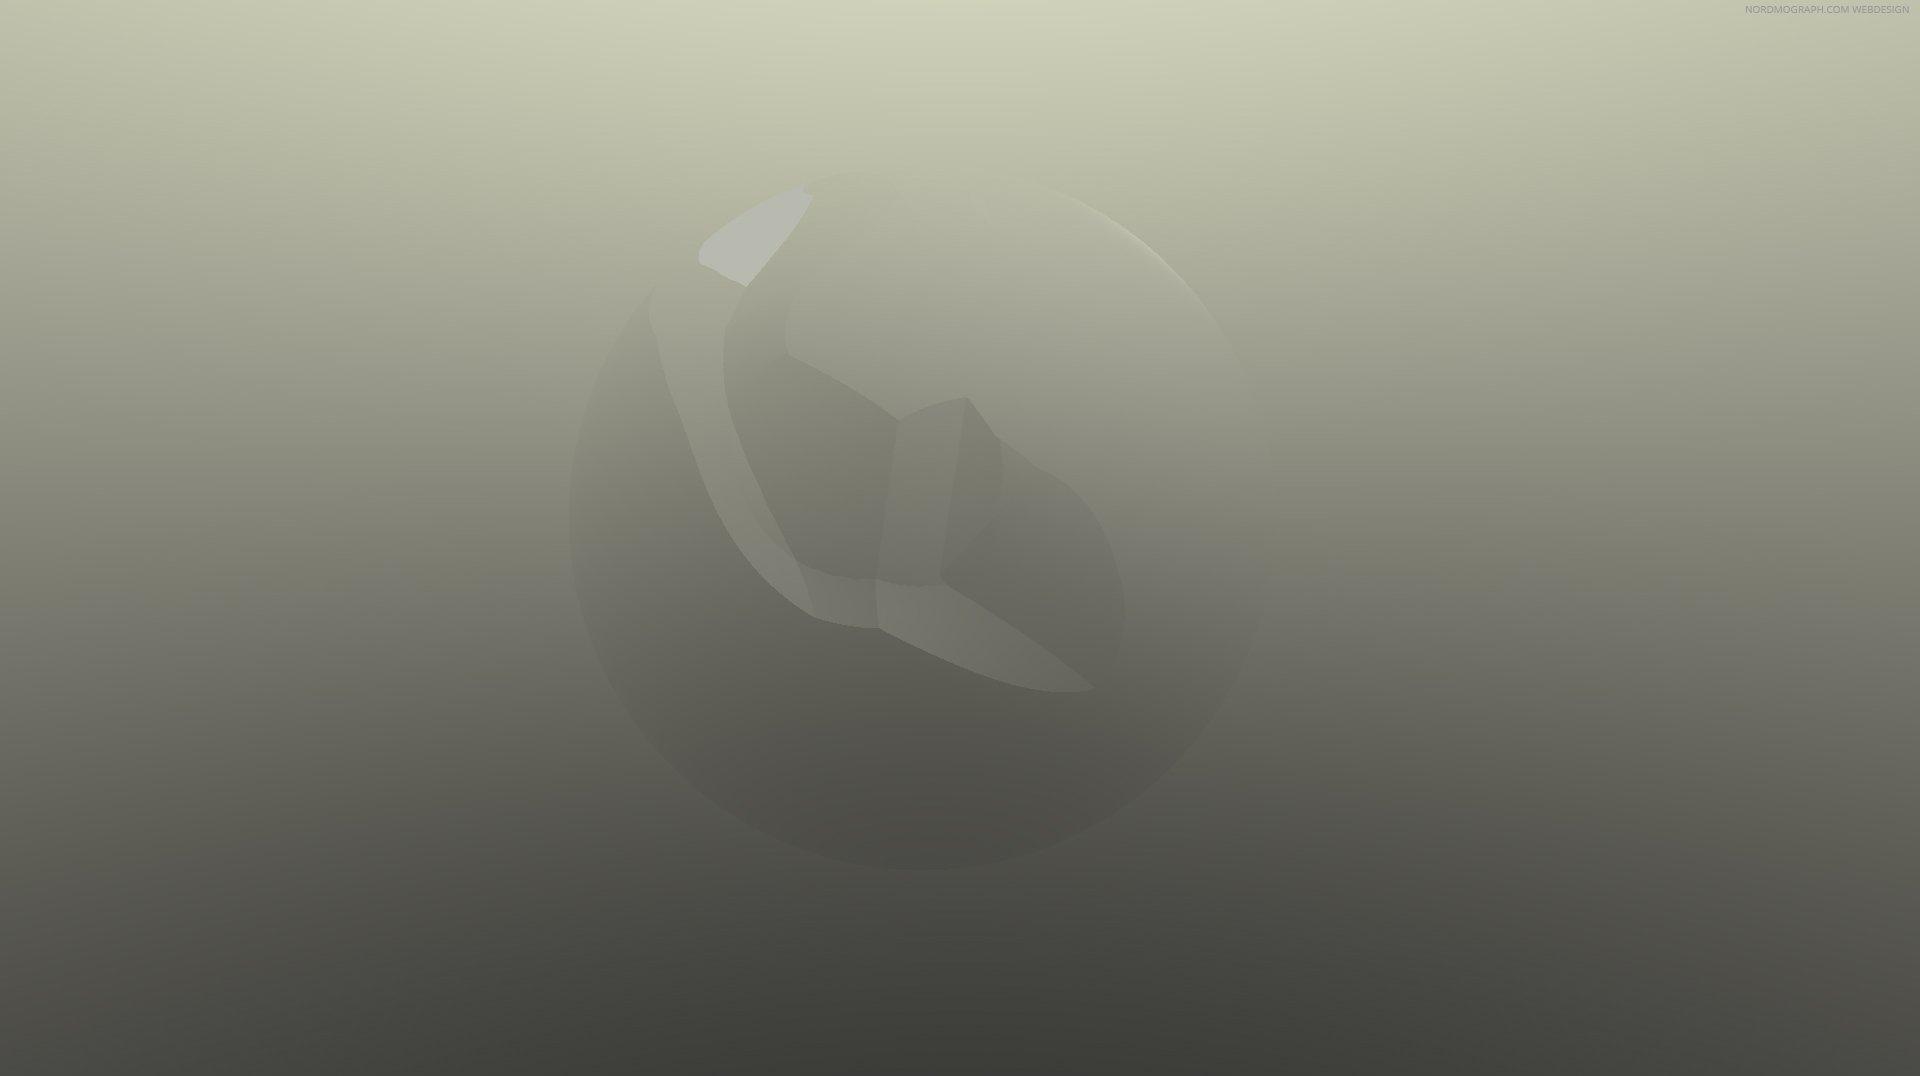 Nordmograph Webdesign - Nordmograph Webdesign - Abstract